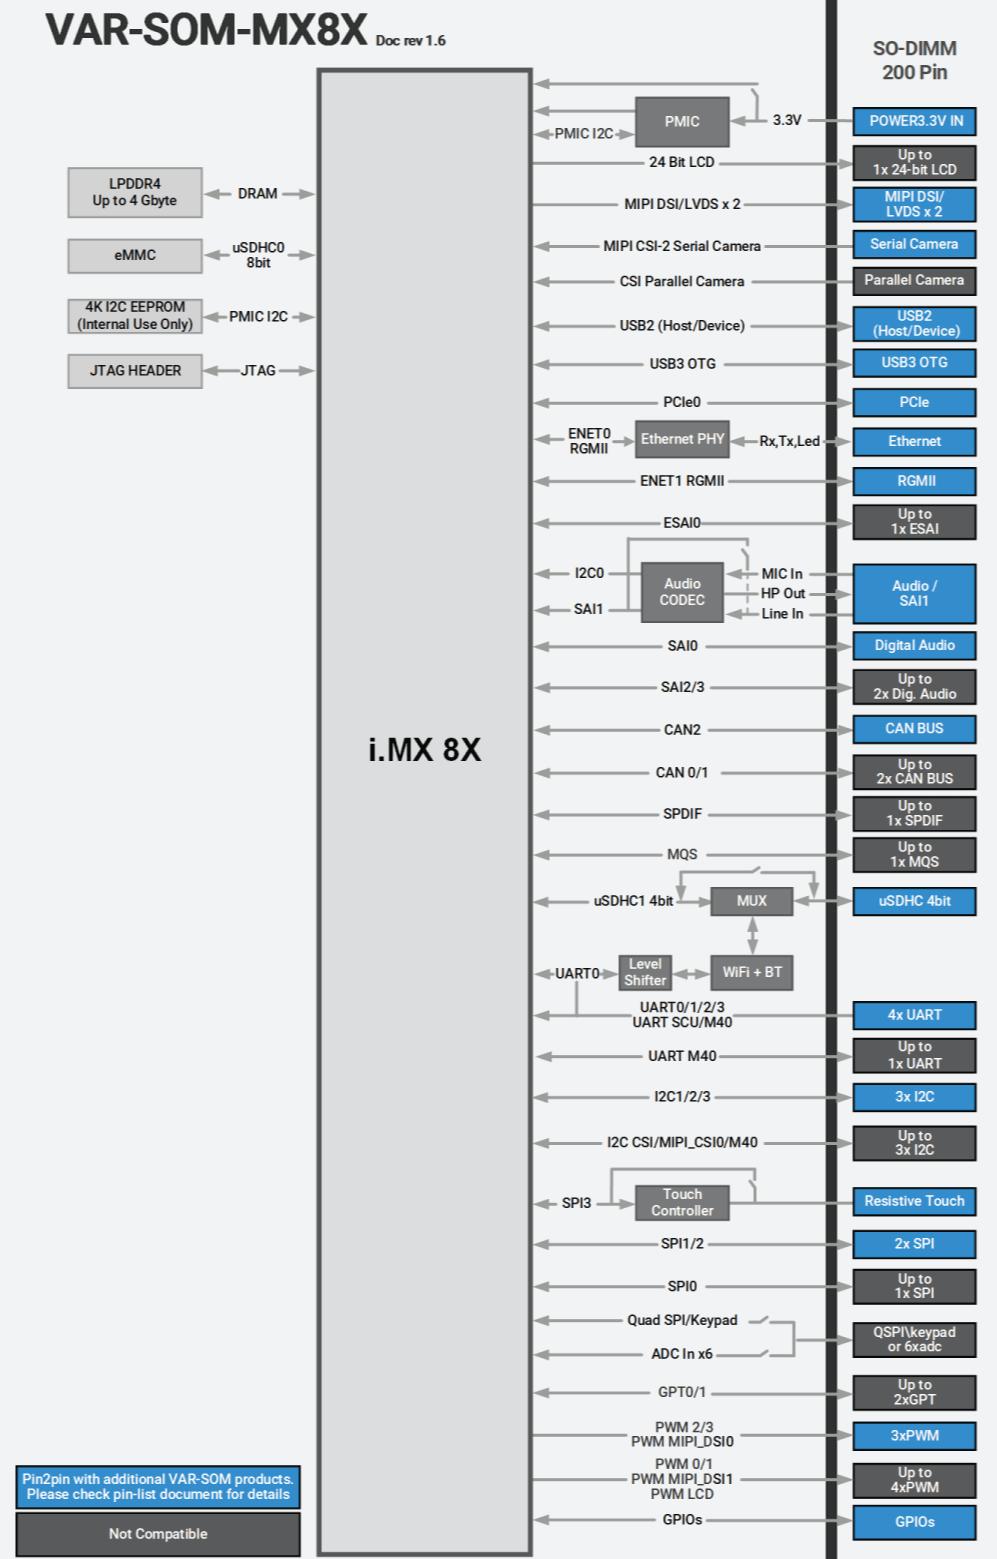 medium resolution of var som mx8x nxp imx8x diagram